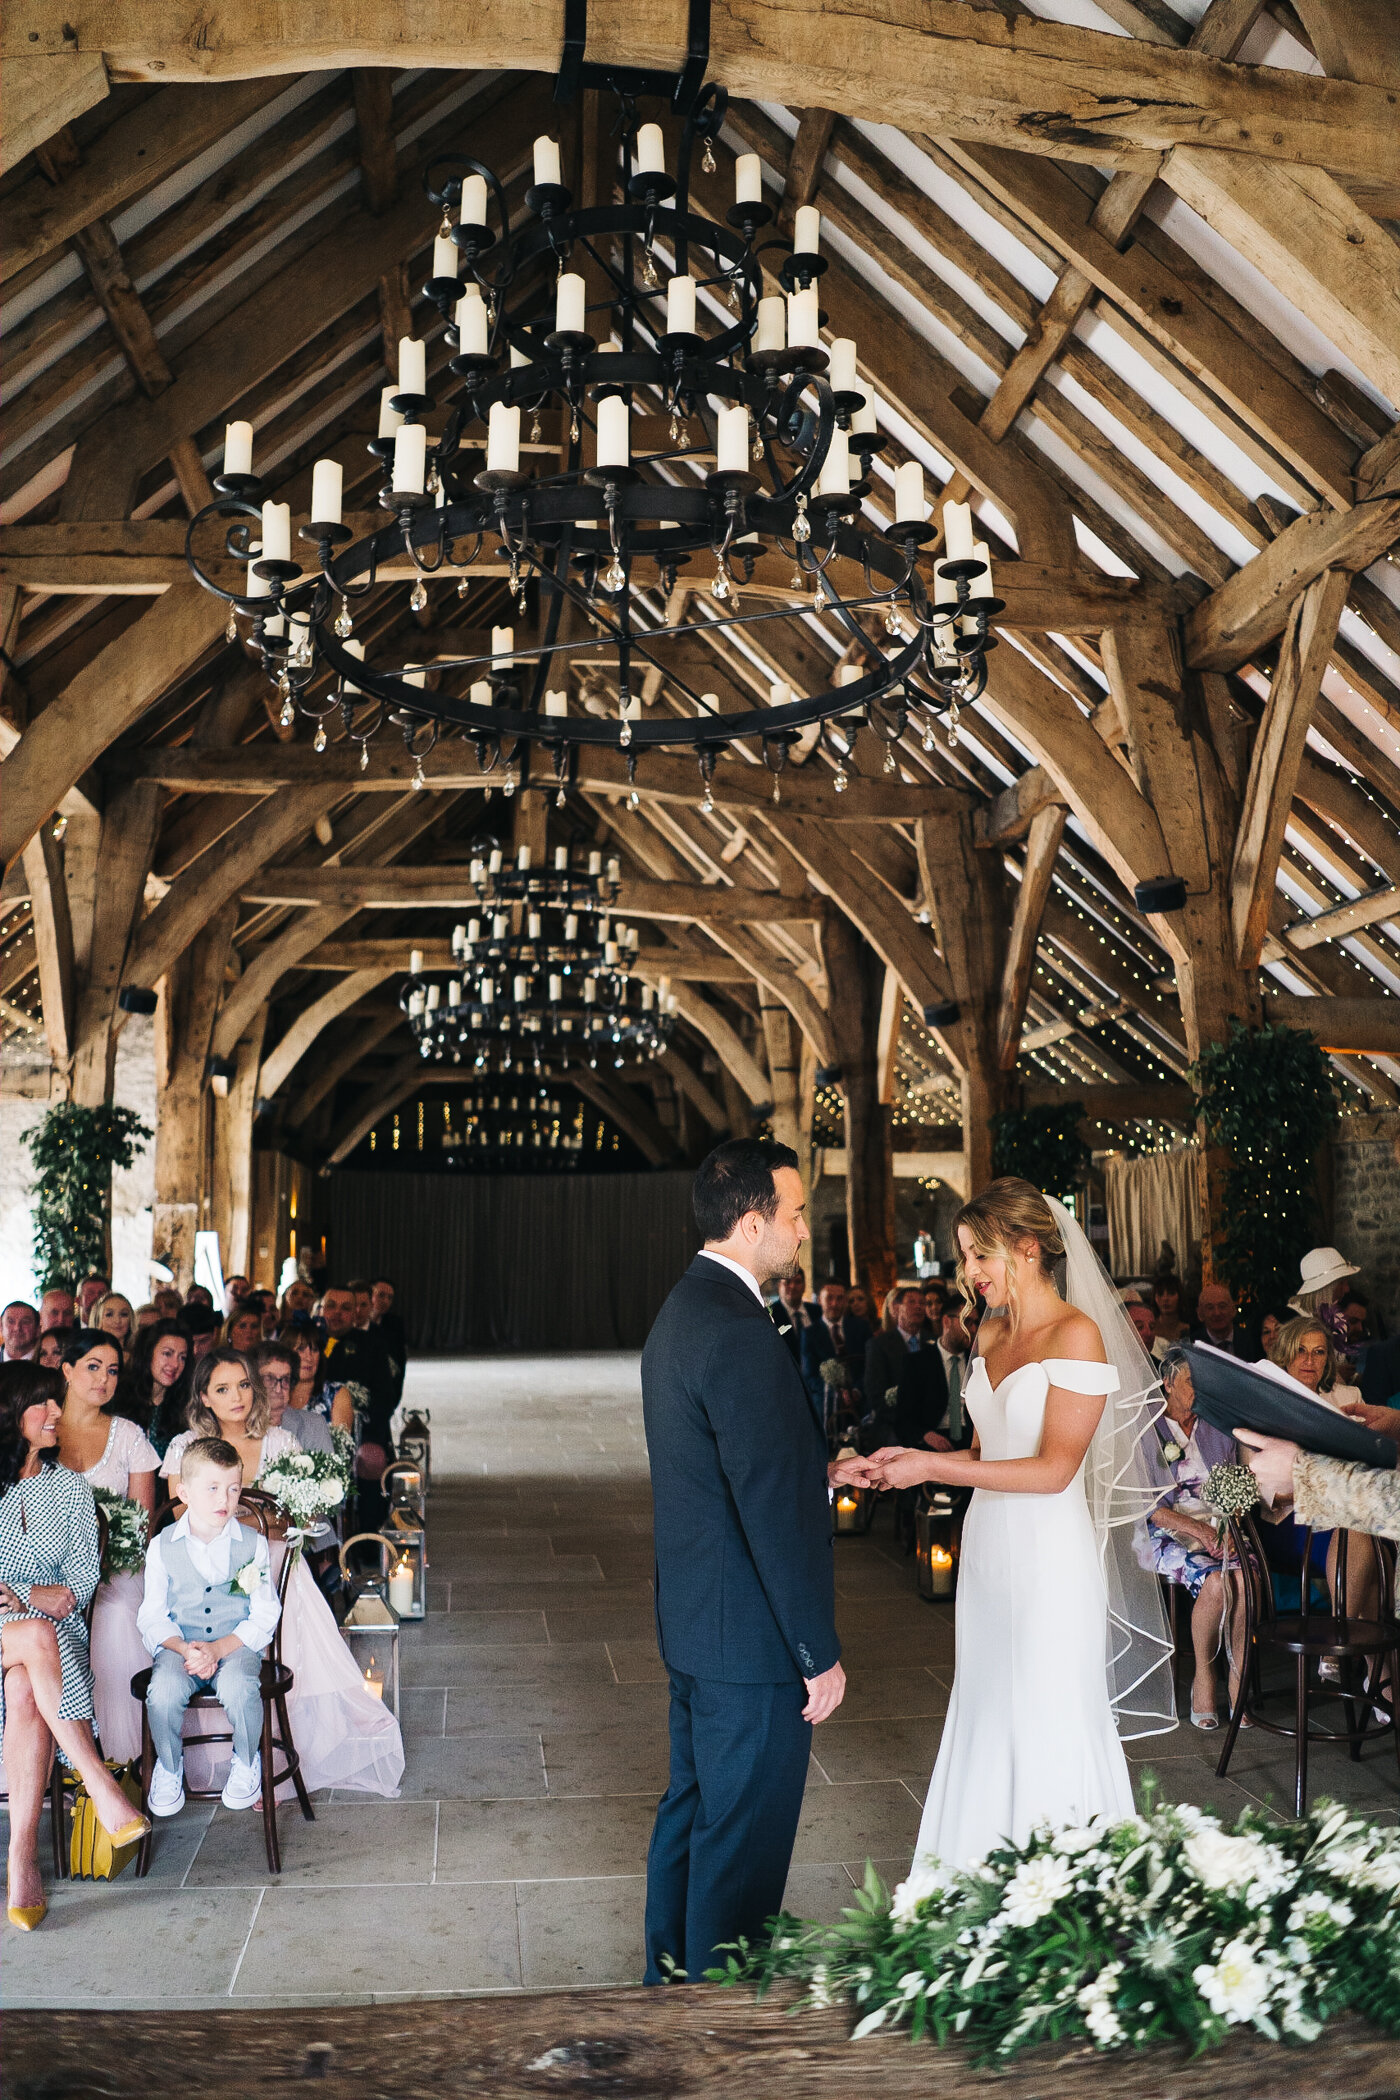 tithe-barn-bolton-abbey-north-yorkshire-cripps-wedding-photographer-creative-0026.jpg